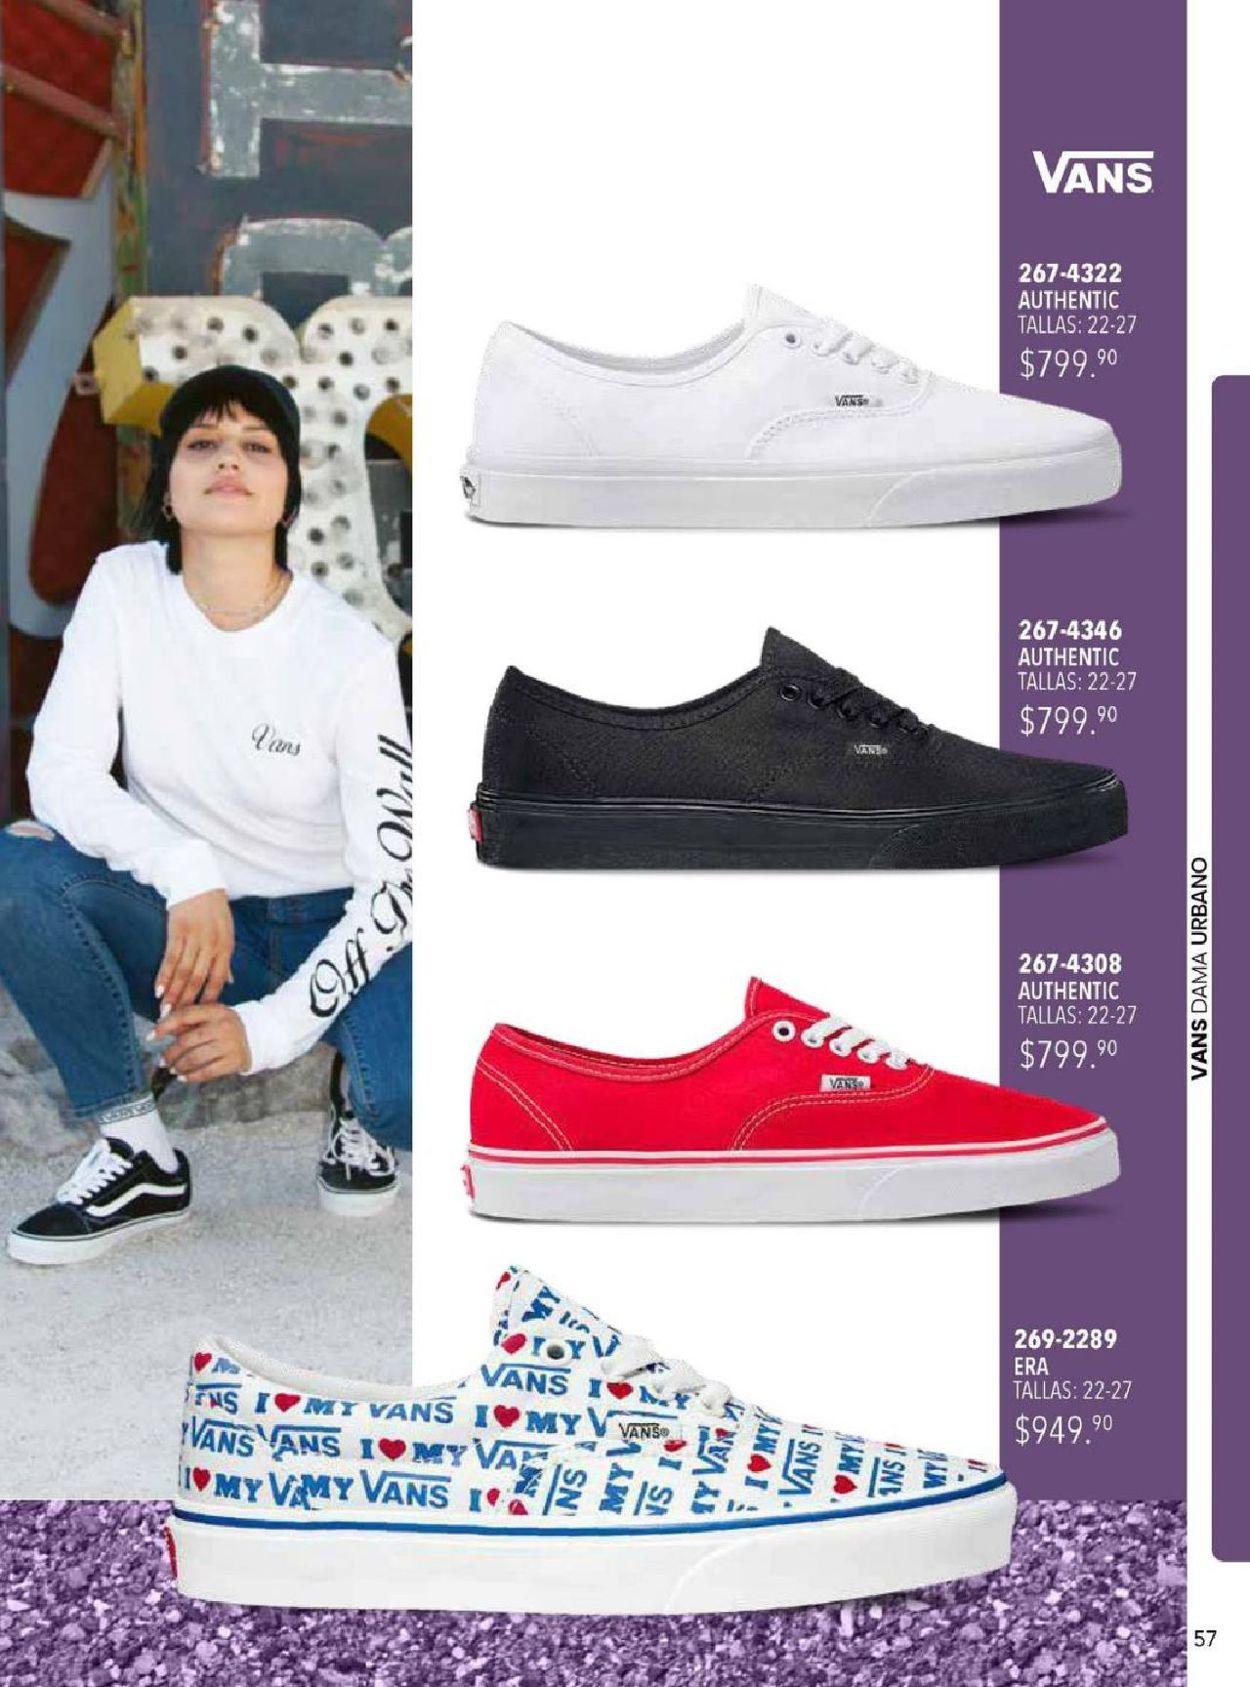 Andrea Folleto - 30.05-31.08.2019 (Página 4)